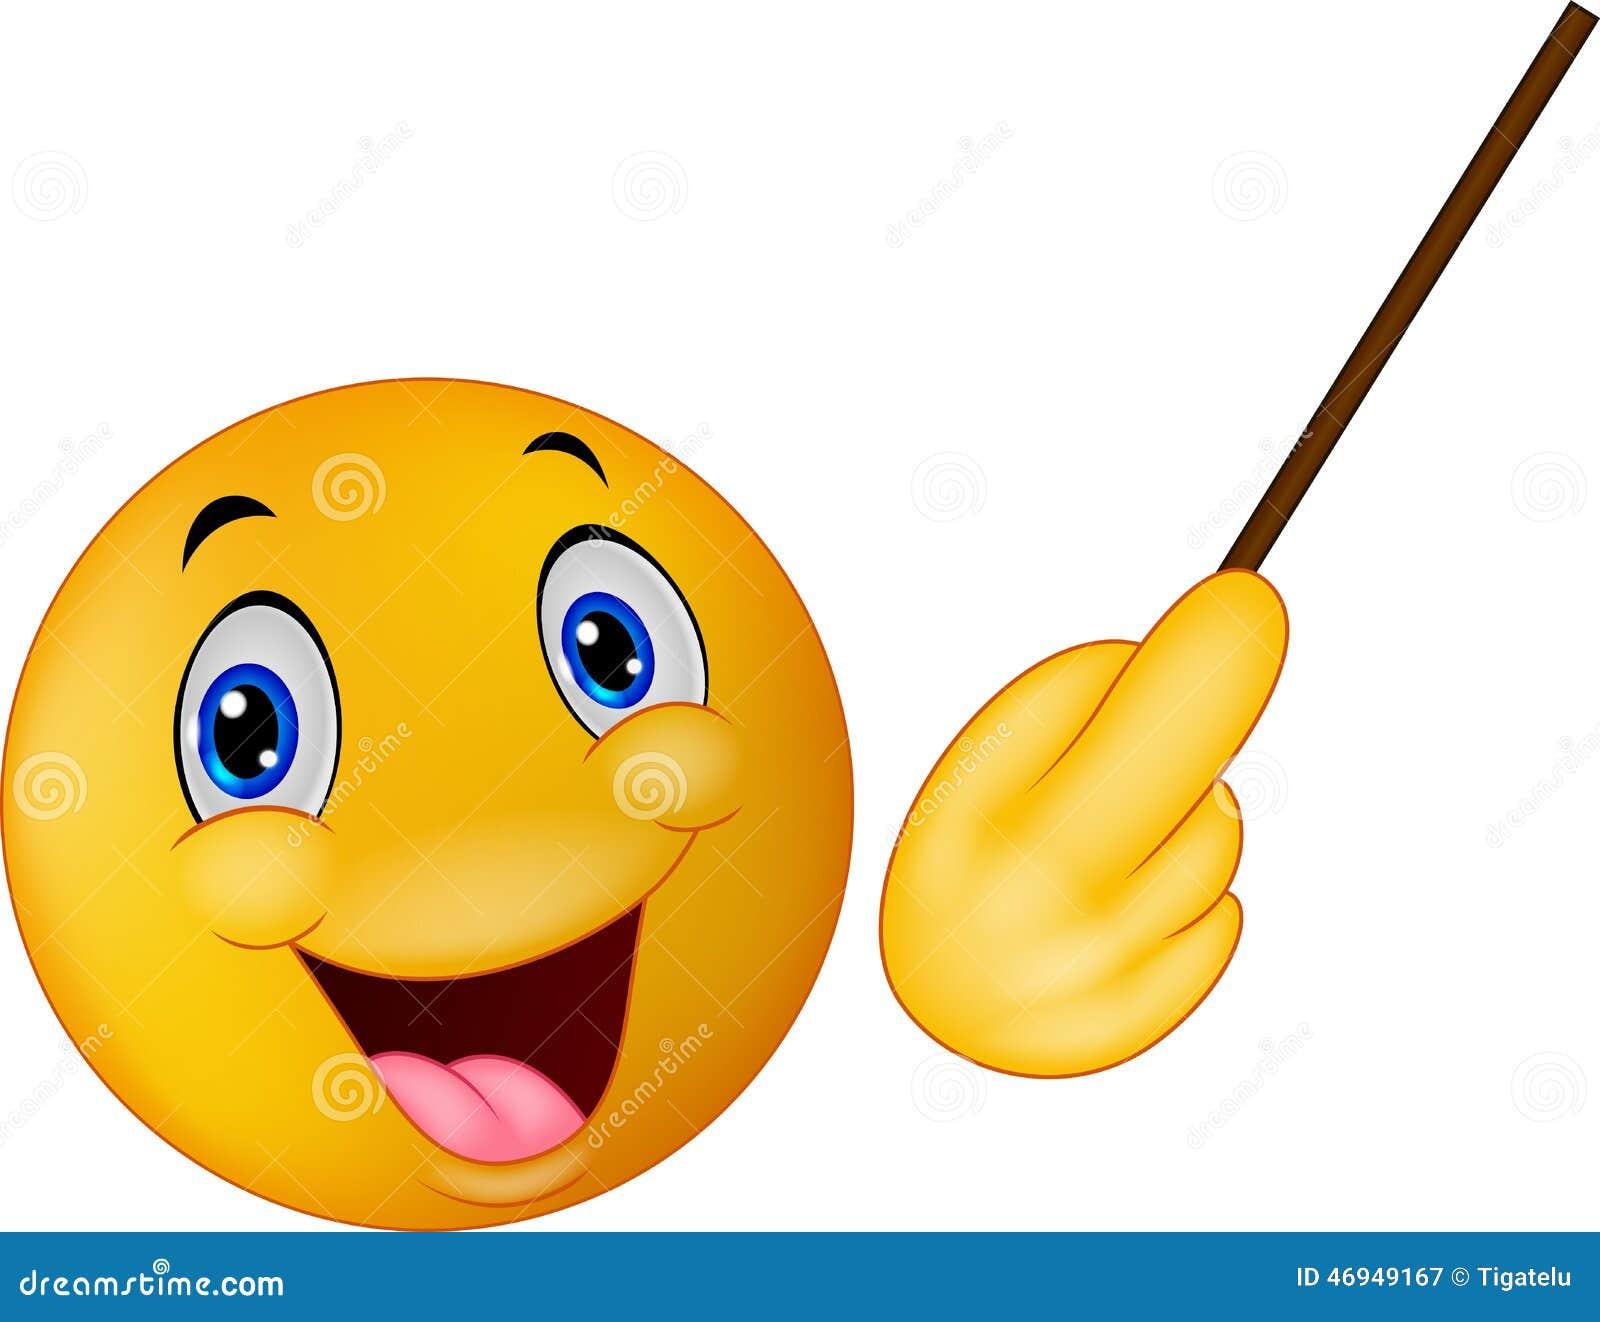 Emoticon Smiley Doing Presentation Stock Vector - Image: 46949167